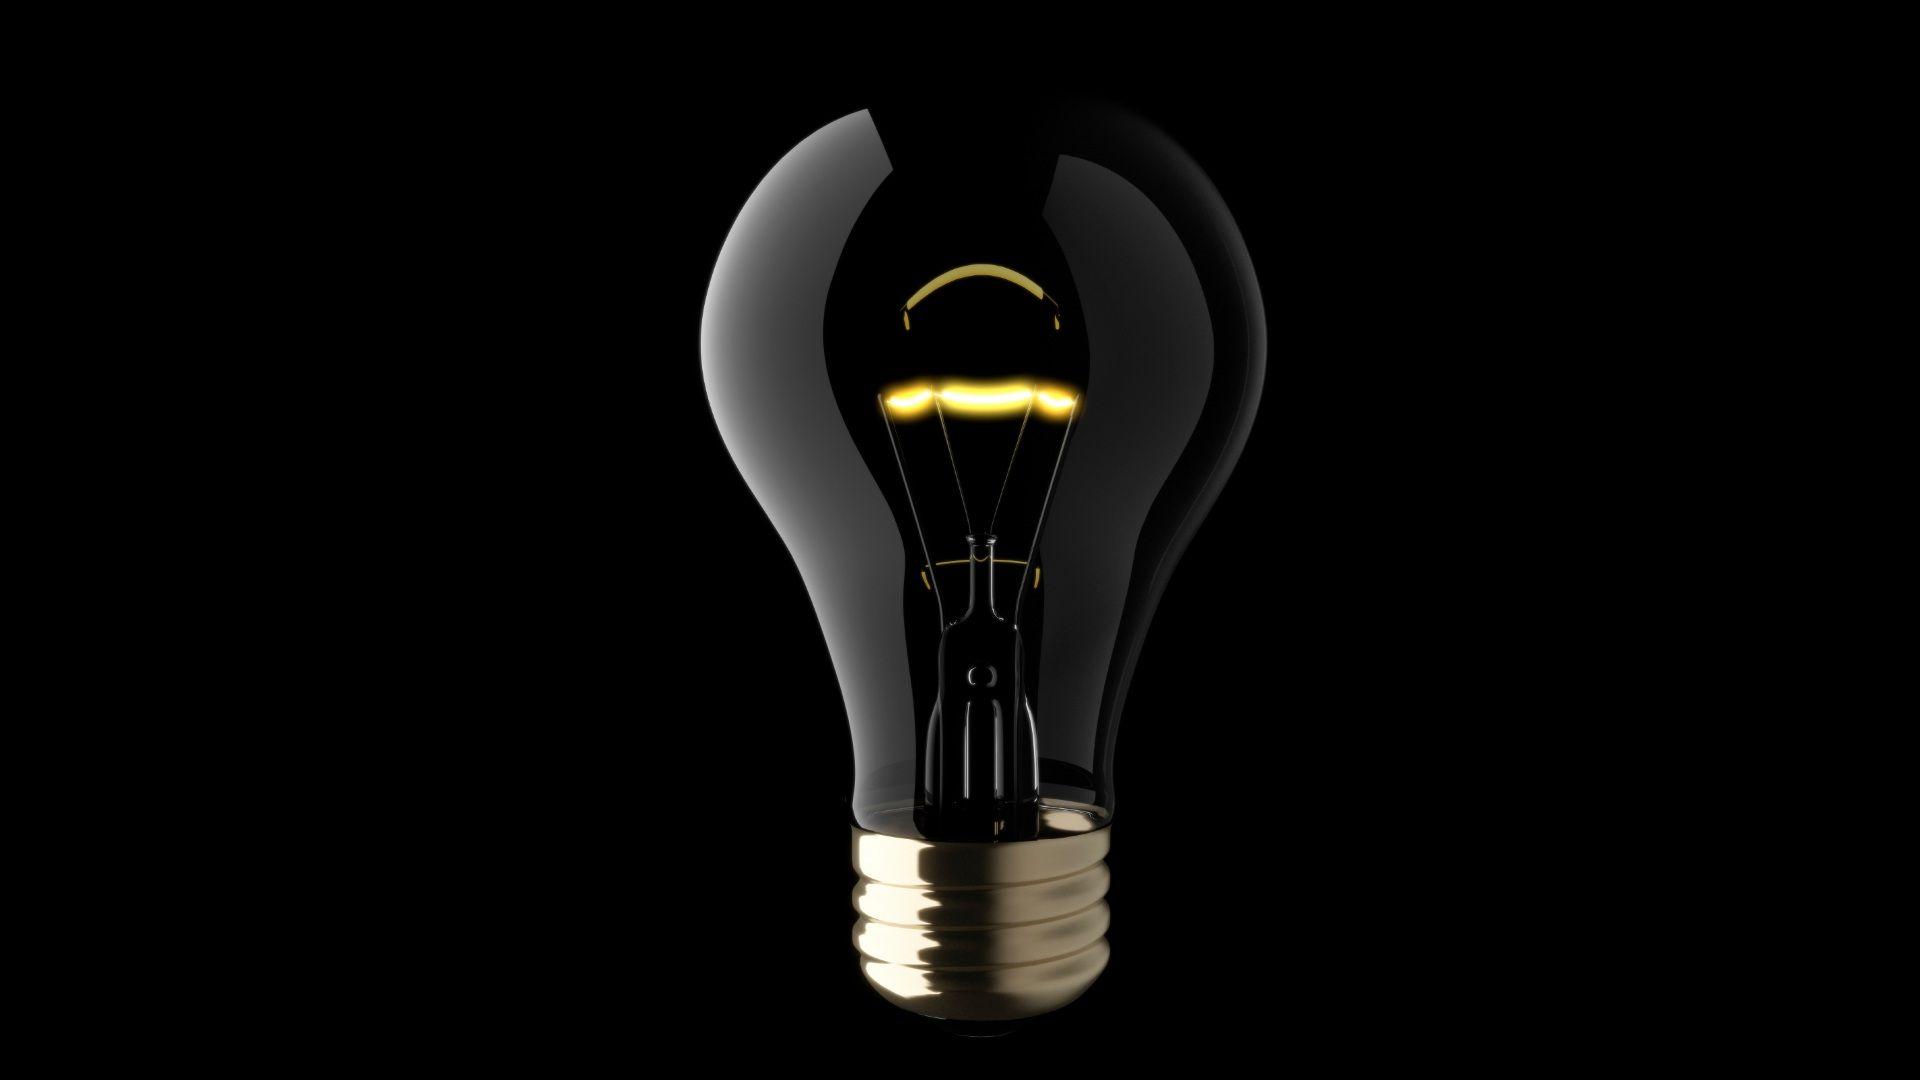 1000 images about lightbulb things on pinterest lightbulbs bulbs - Light Bulb Computer Wallpapers Desktop Backgrounds 1920x1080